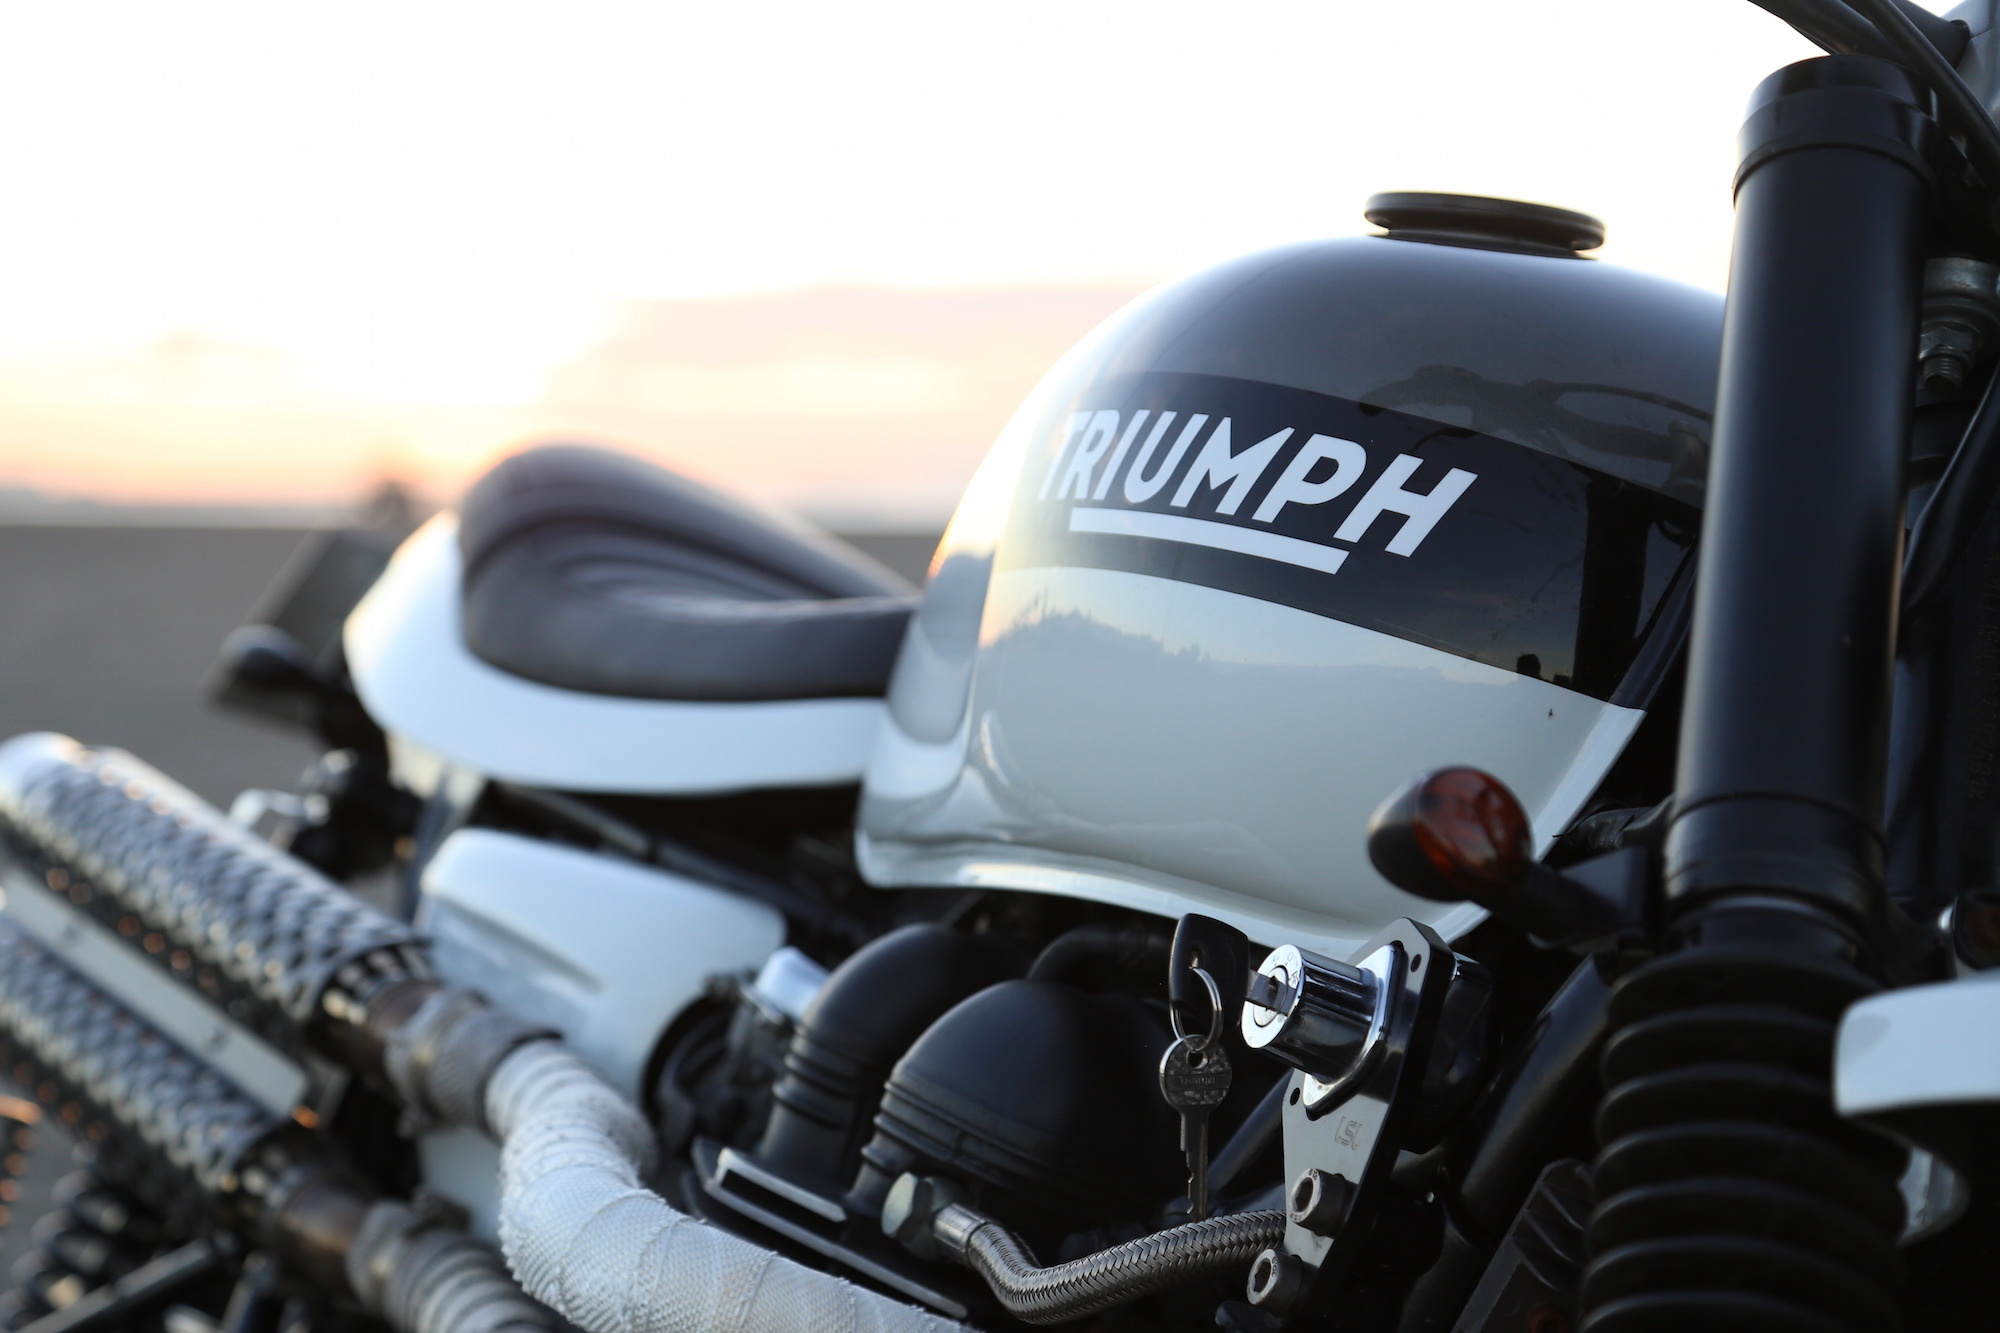 Triumph Scrambler by Tamarit Spanish Motorcycles 6